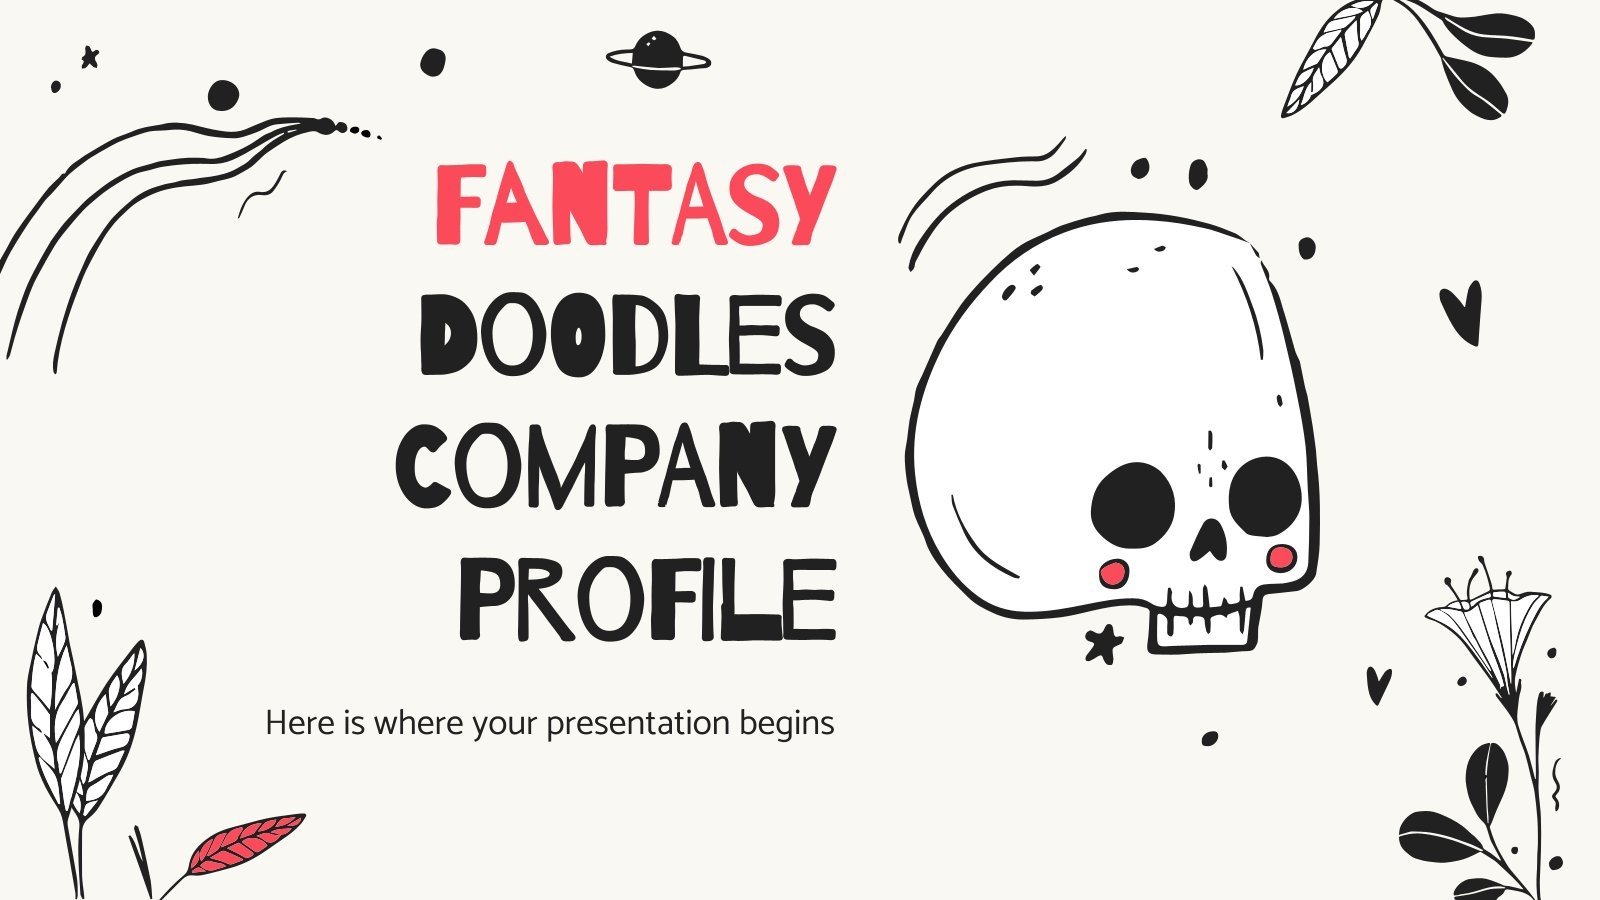 Fantasy Doodles Company Profile presentation template